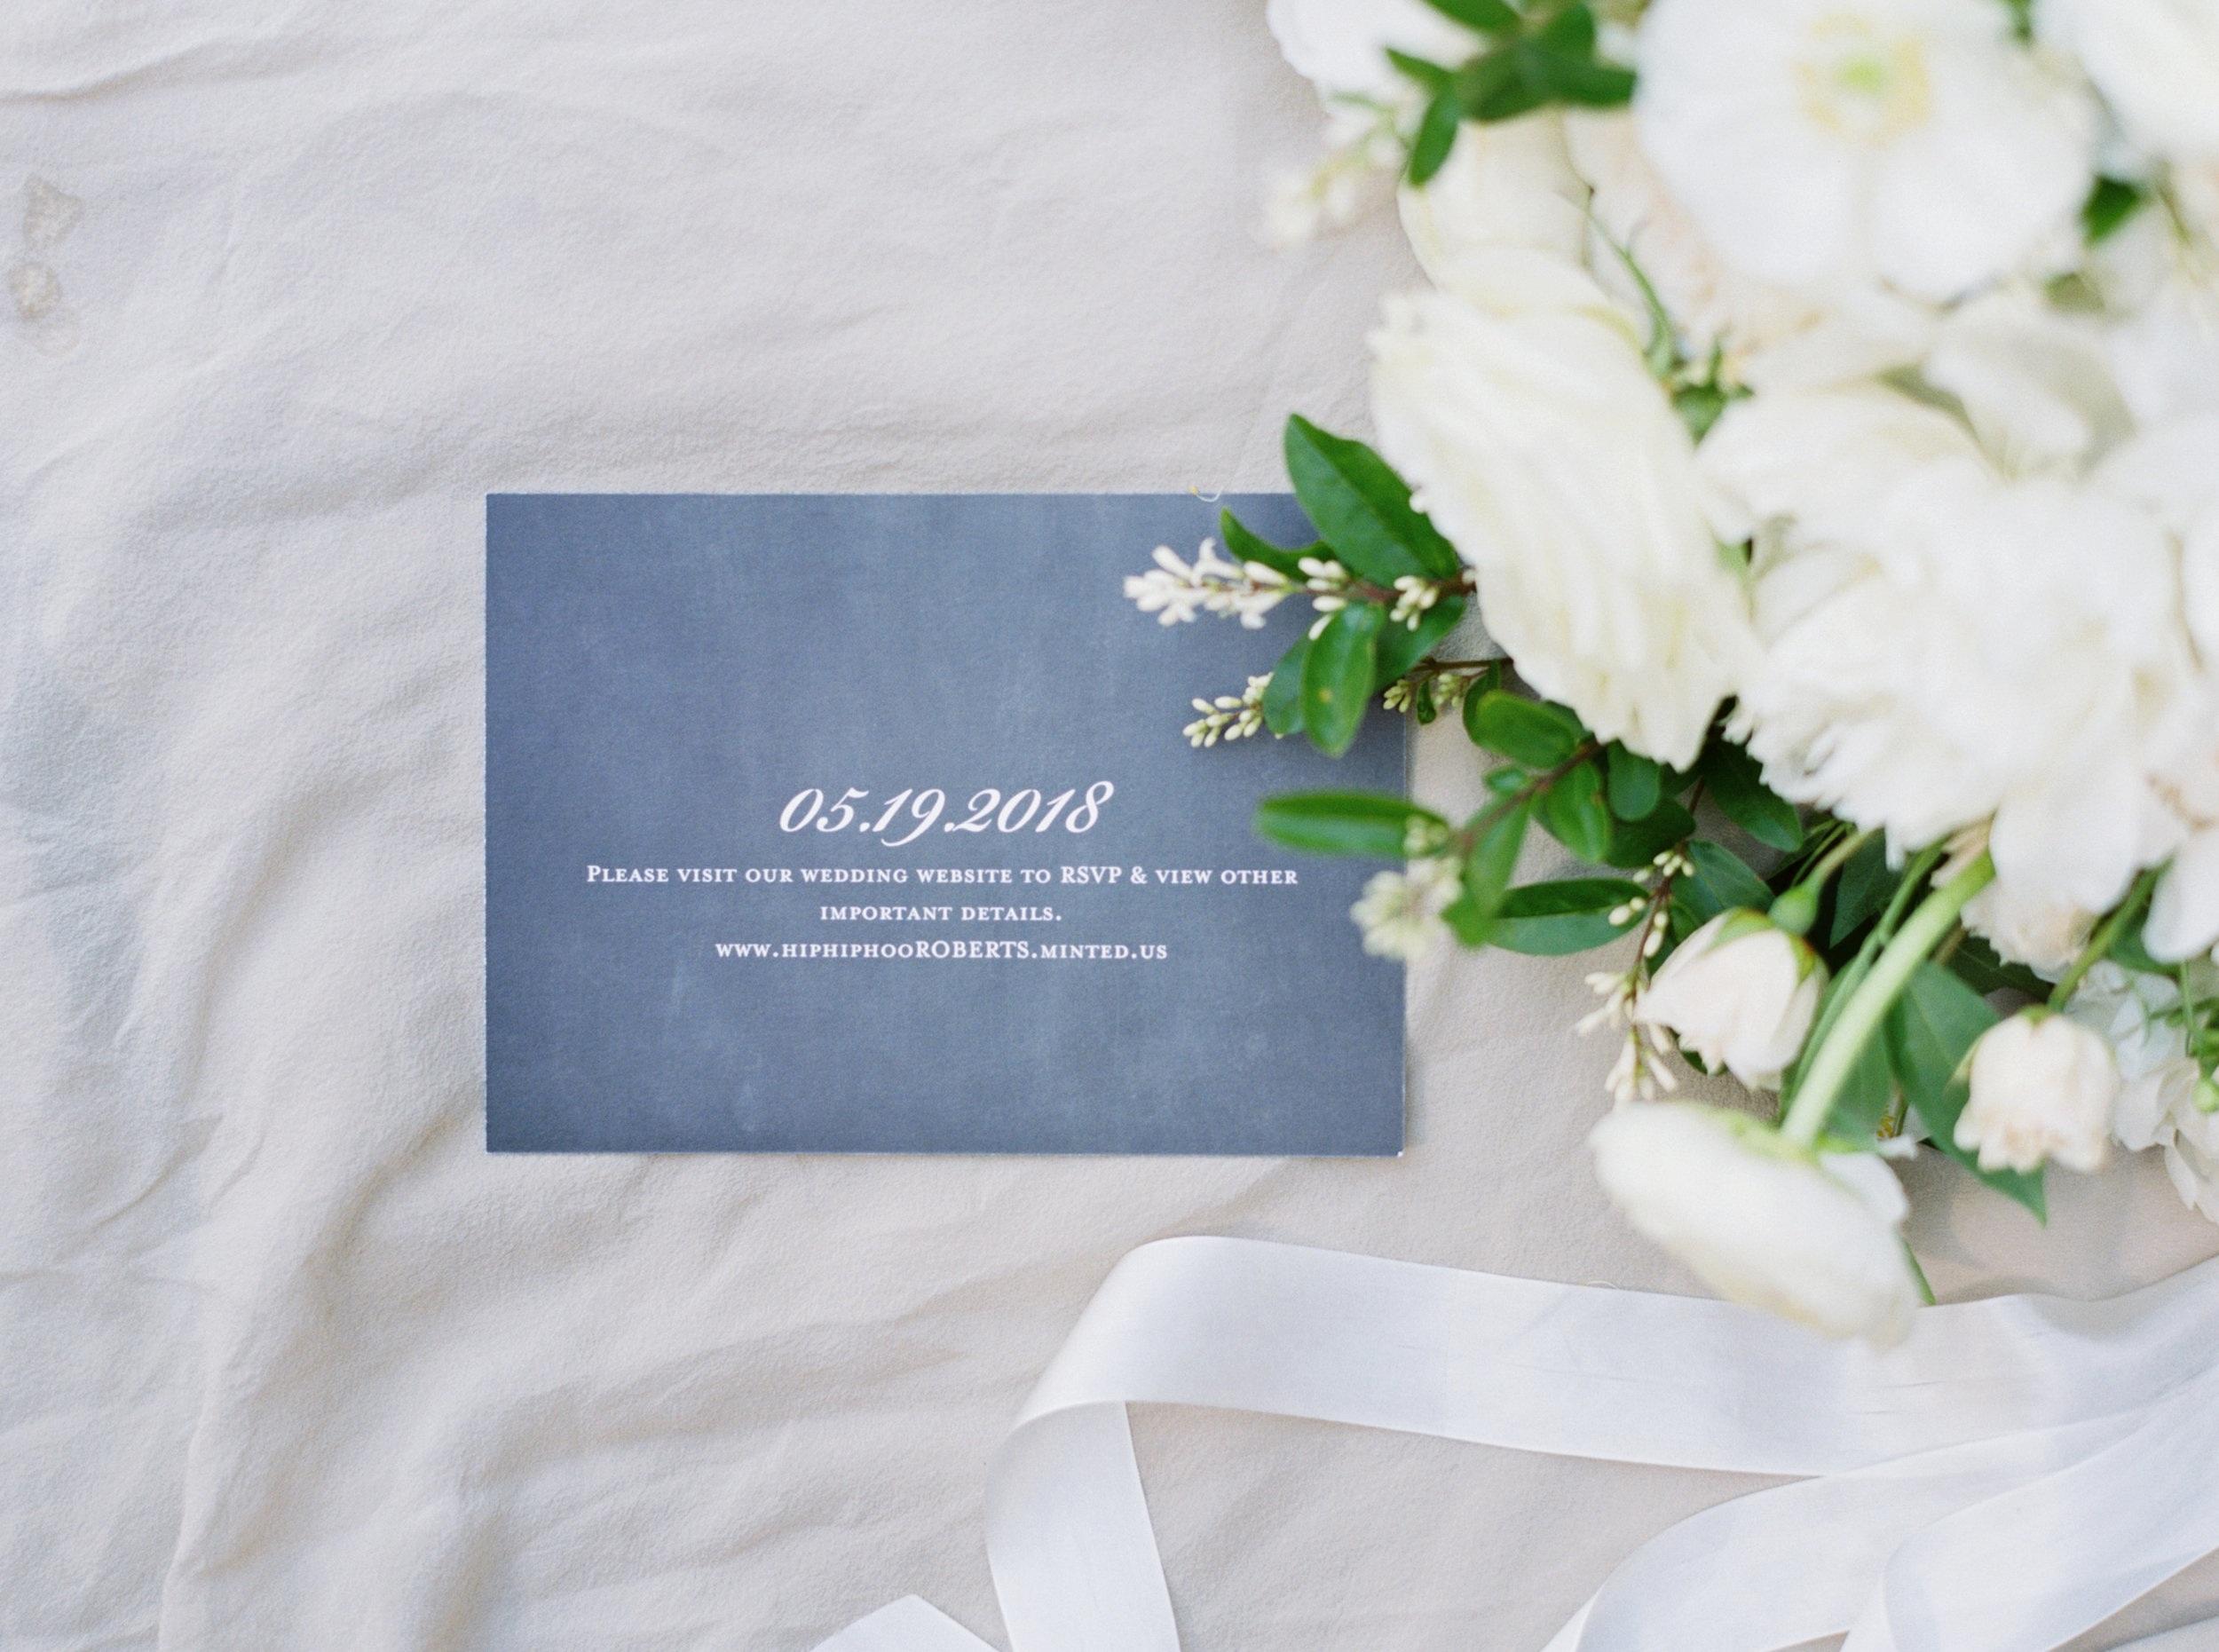 Roberts+Wedding-Roberts+Wedding-0200.jpg